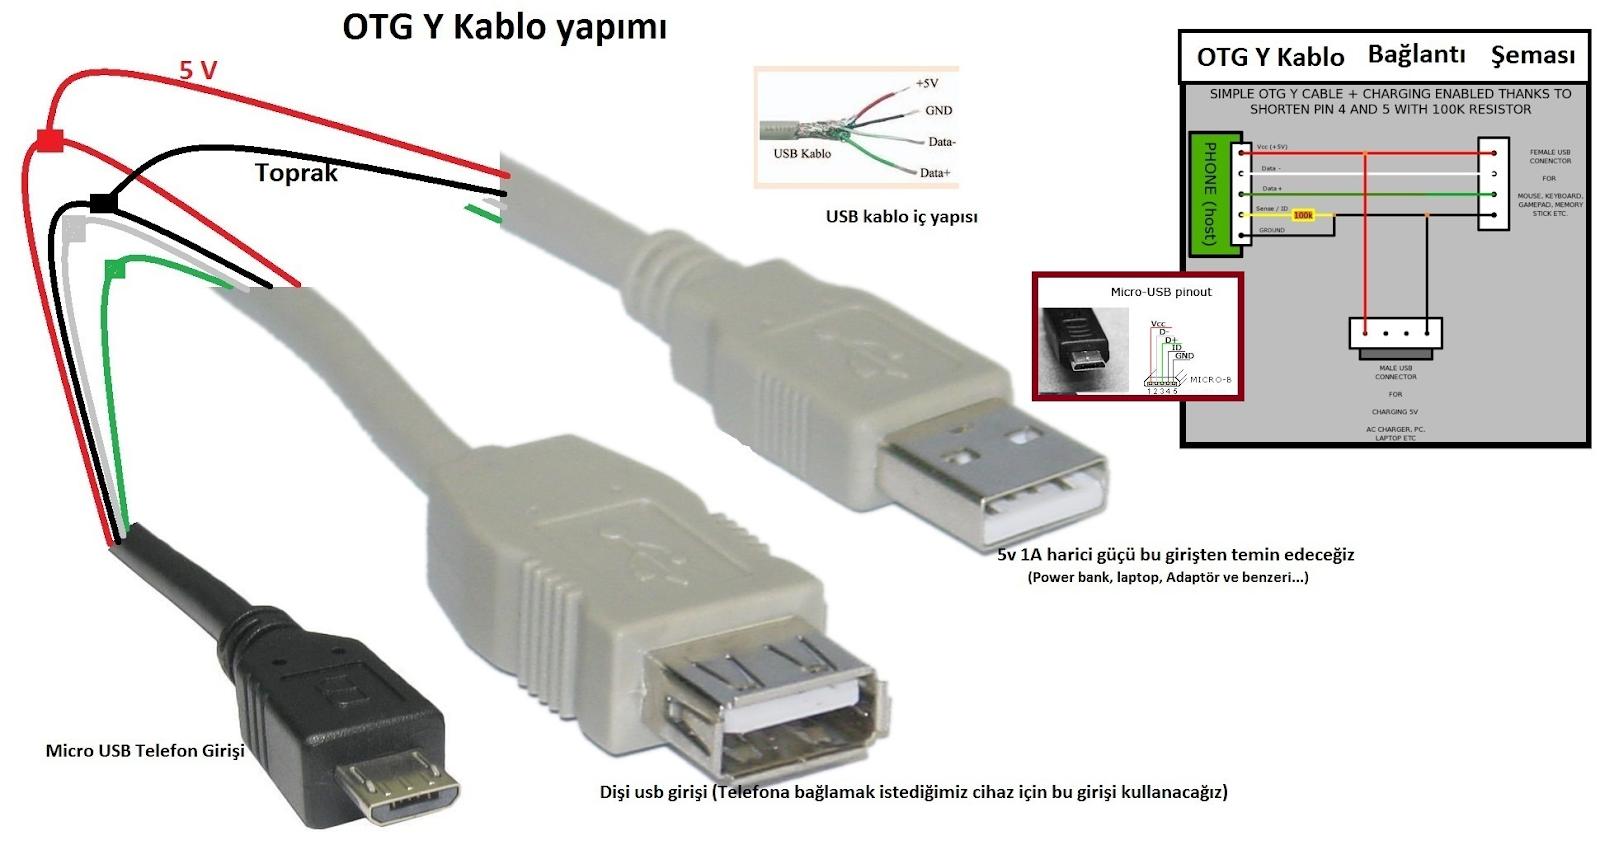 Samsung USB Kablo Şeması - Android Hastanem